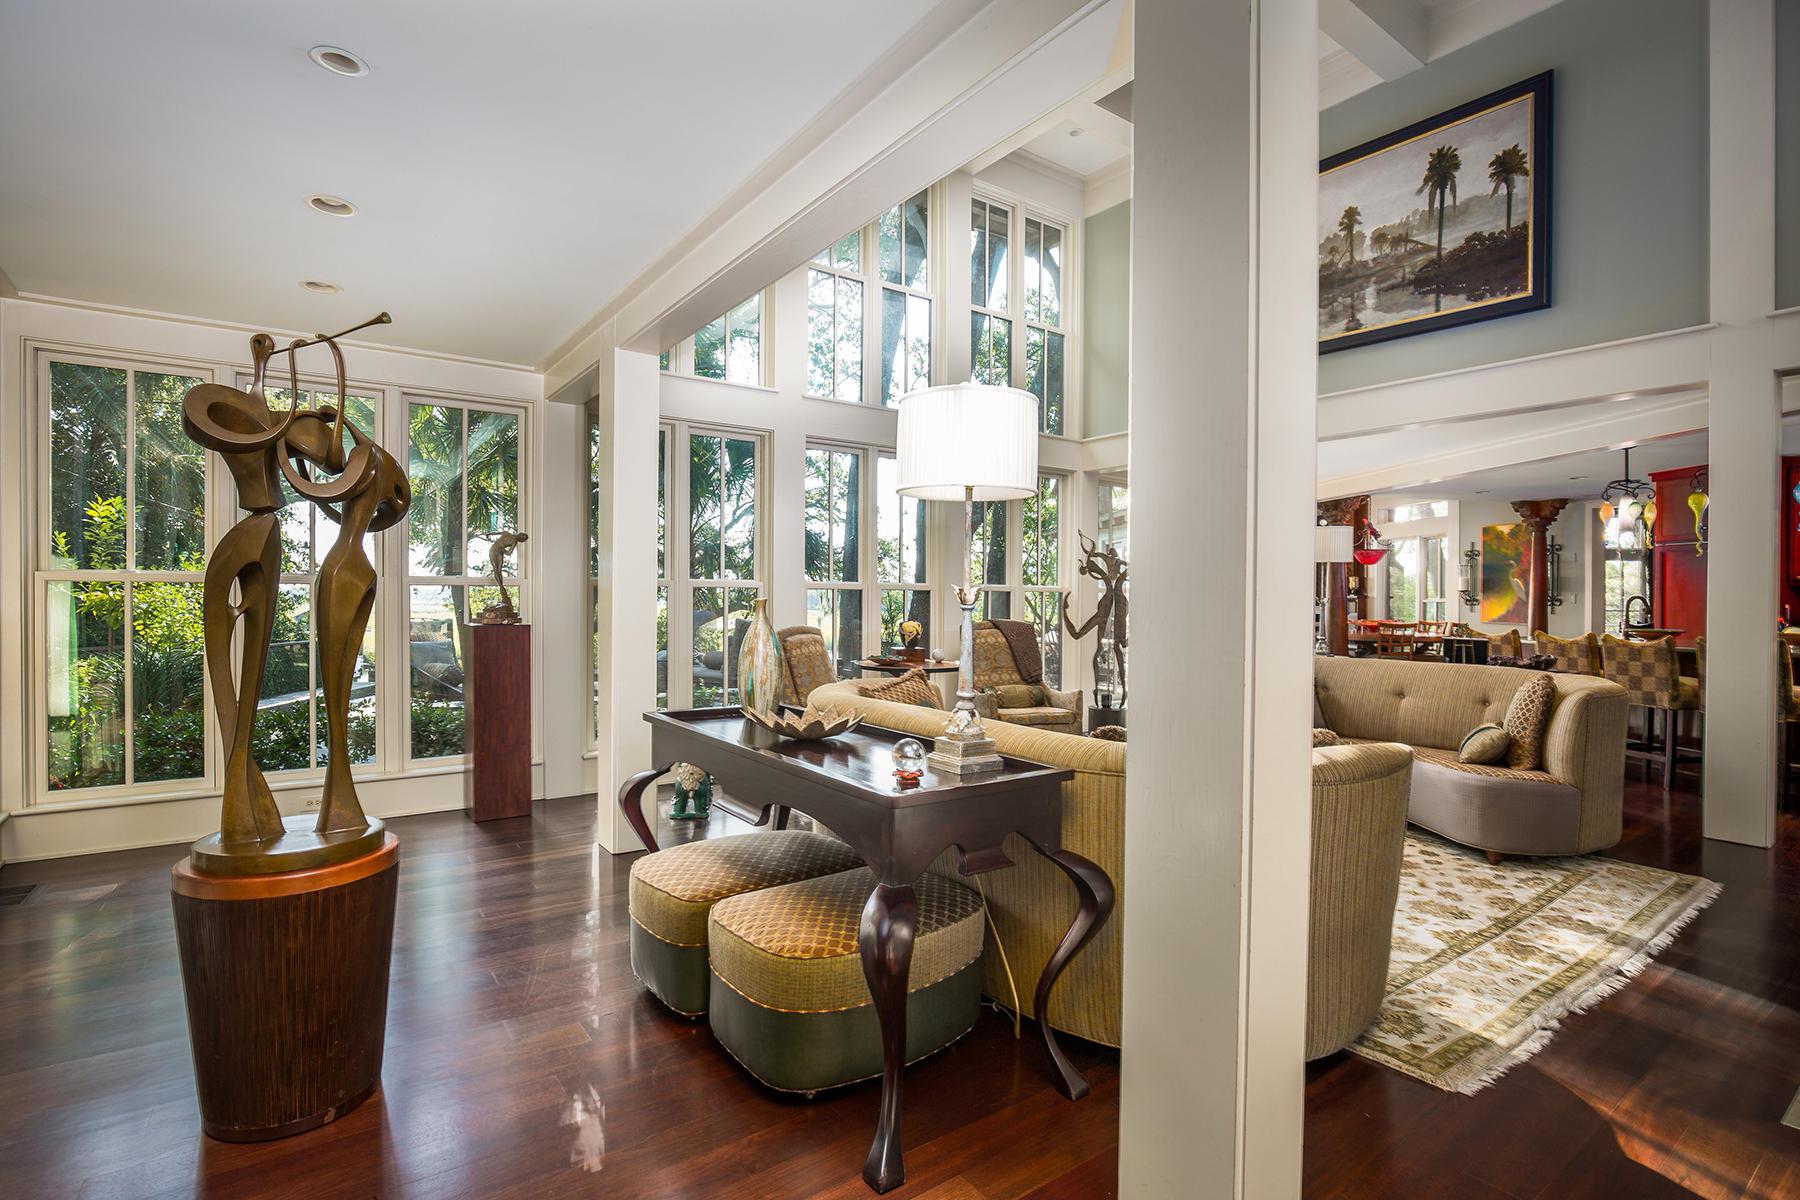 Ellis Oaks Homes For Sale - 672 Ellis Oak, Charleston, SC - 12